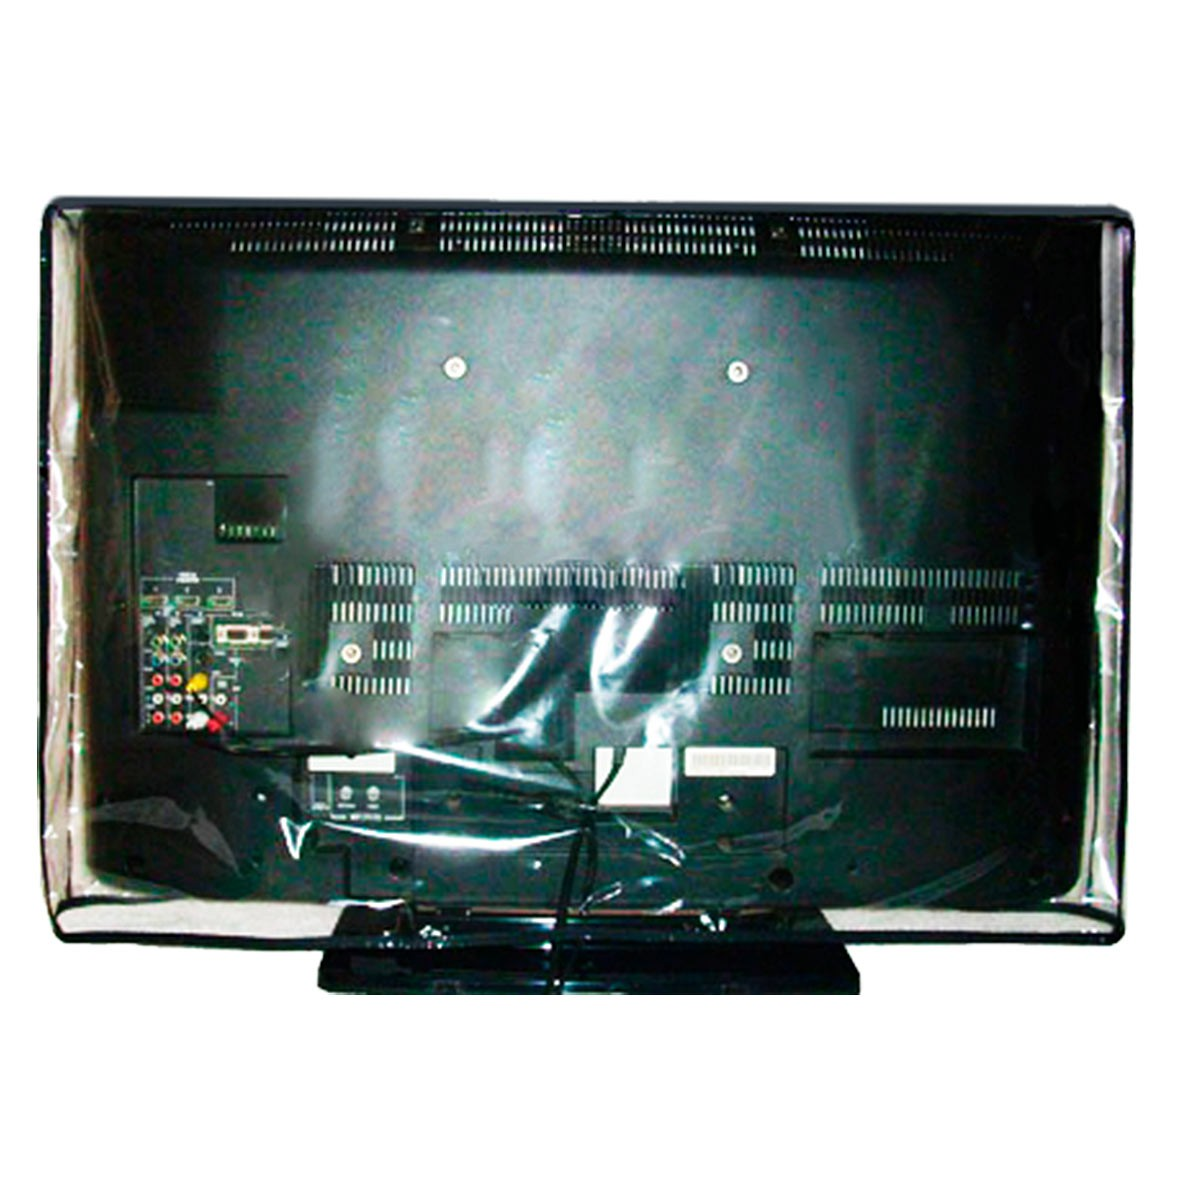 Capa Para Tv Lcd 50 Pvc Cristal - Fechada